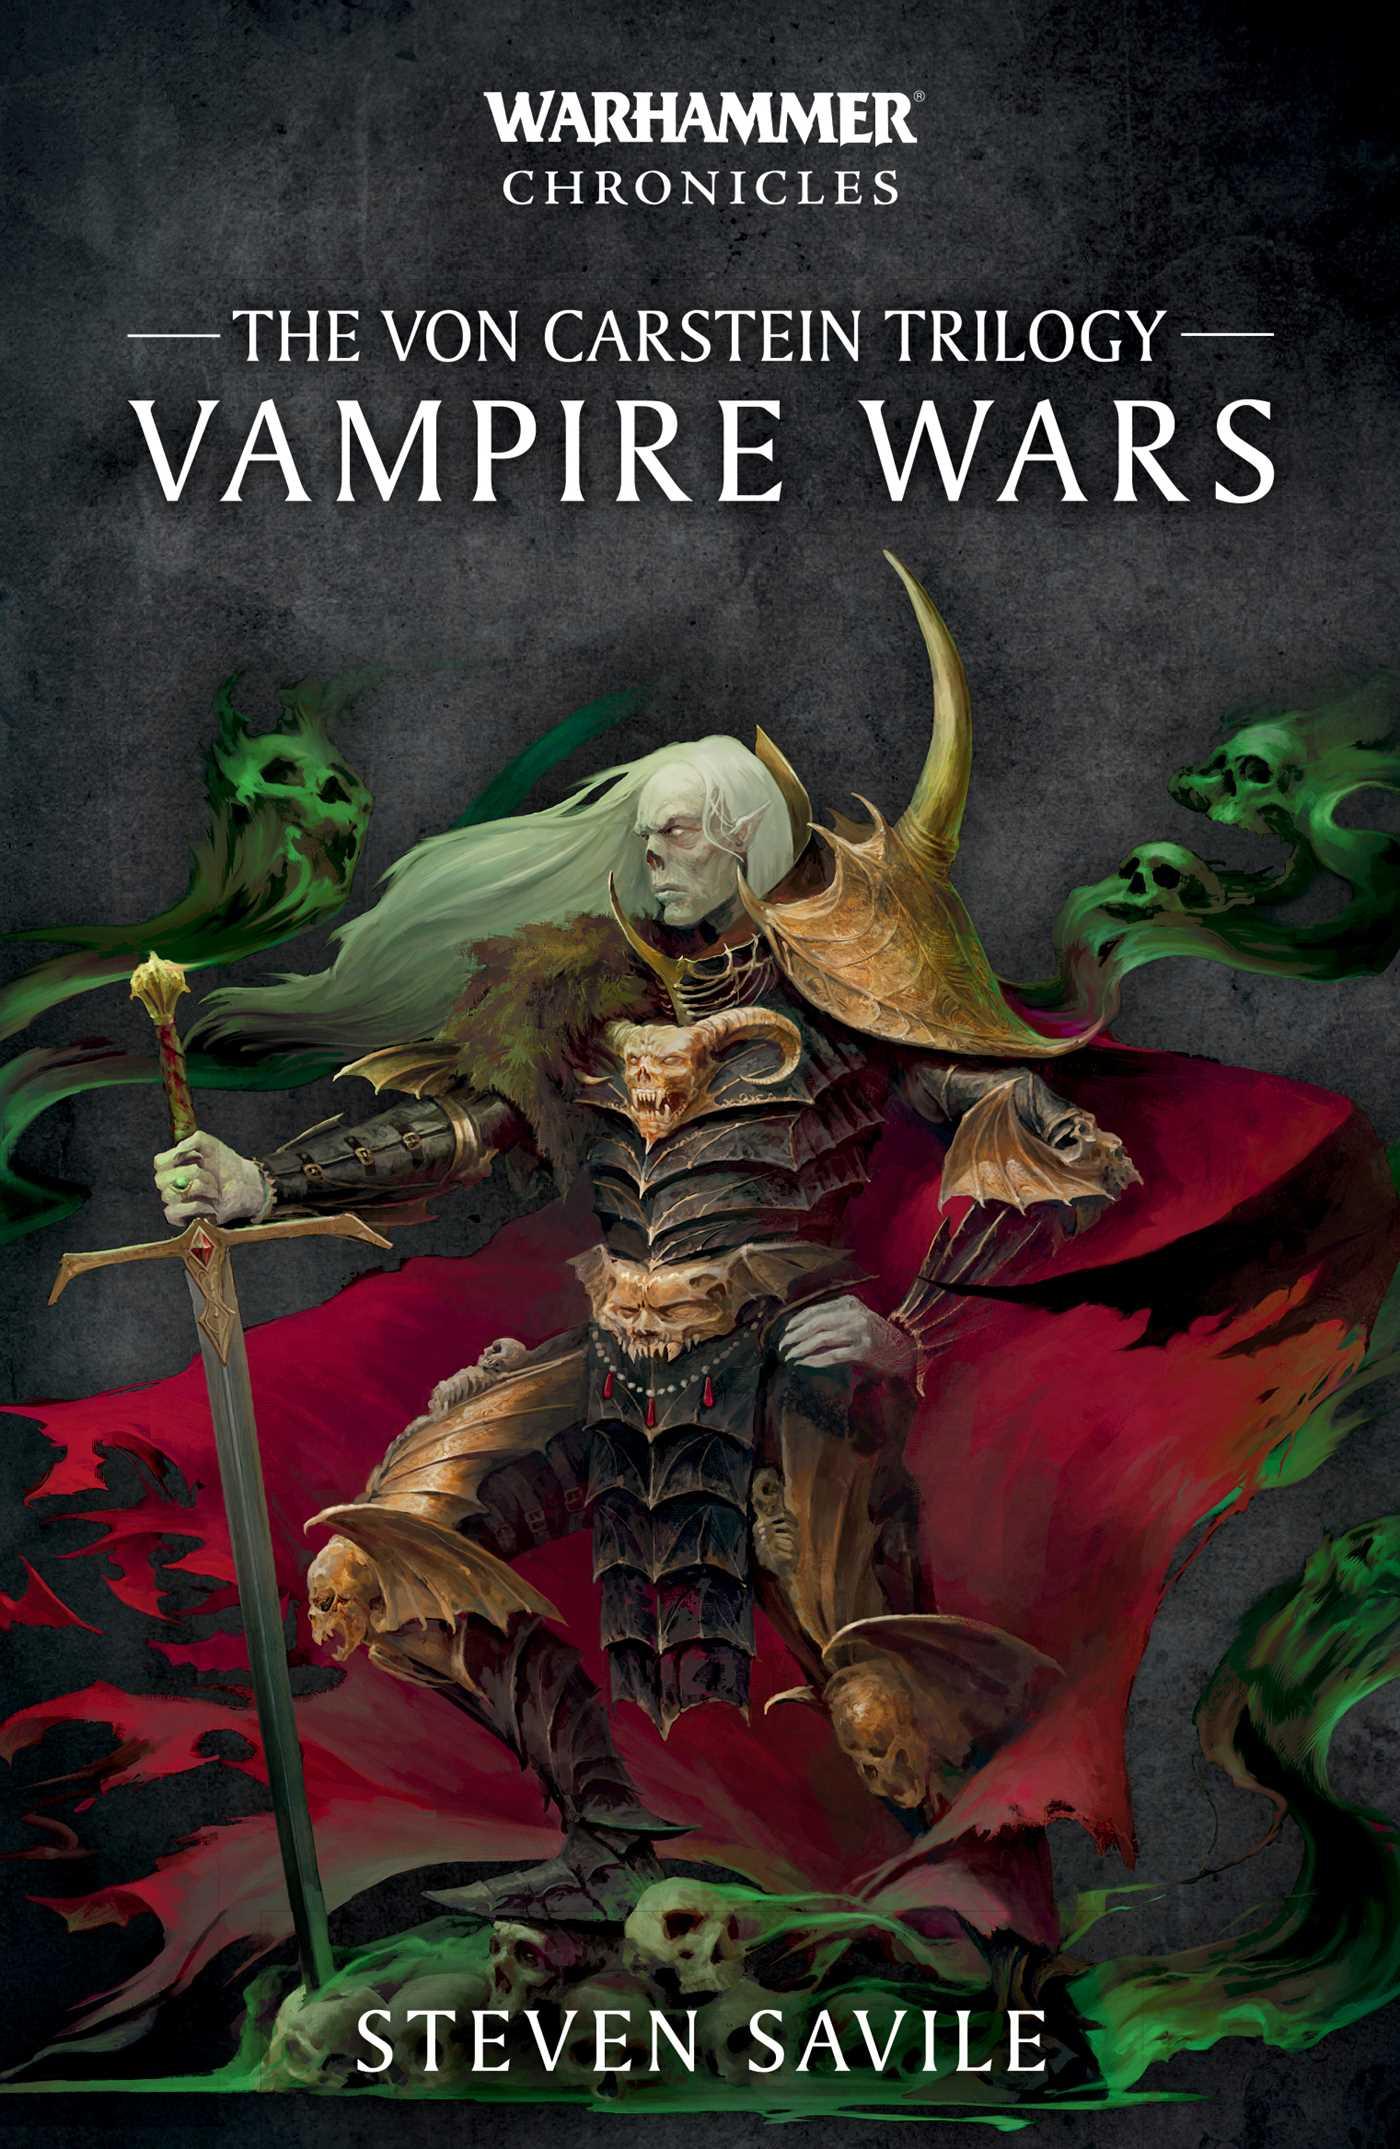 Vampire wars 9781784966287 hr